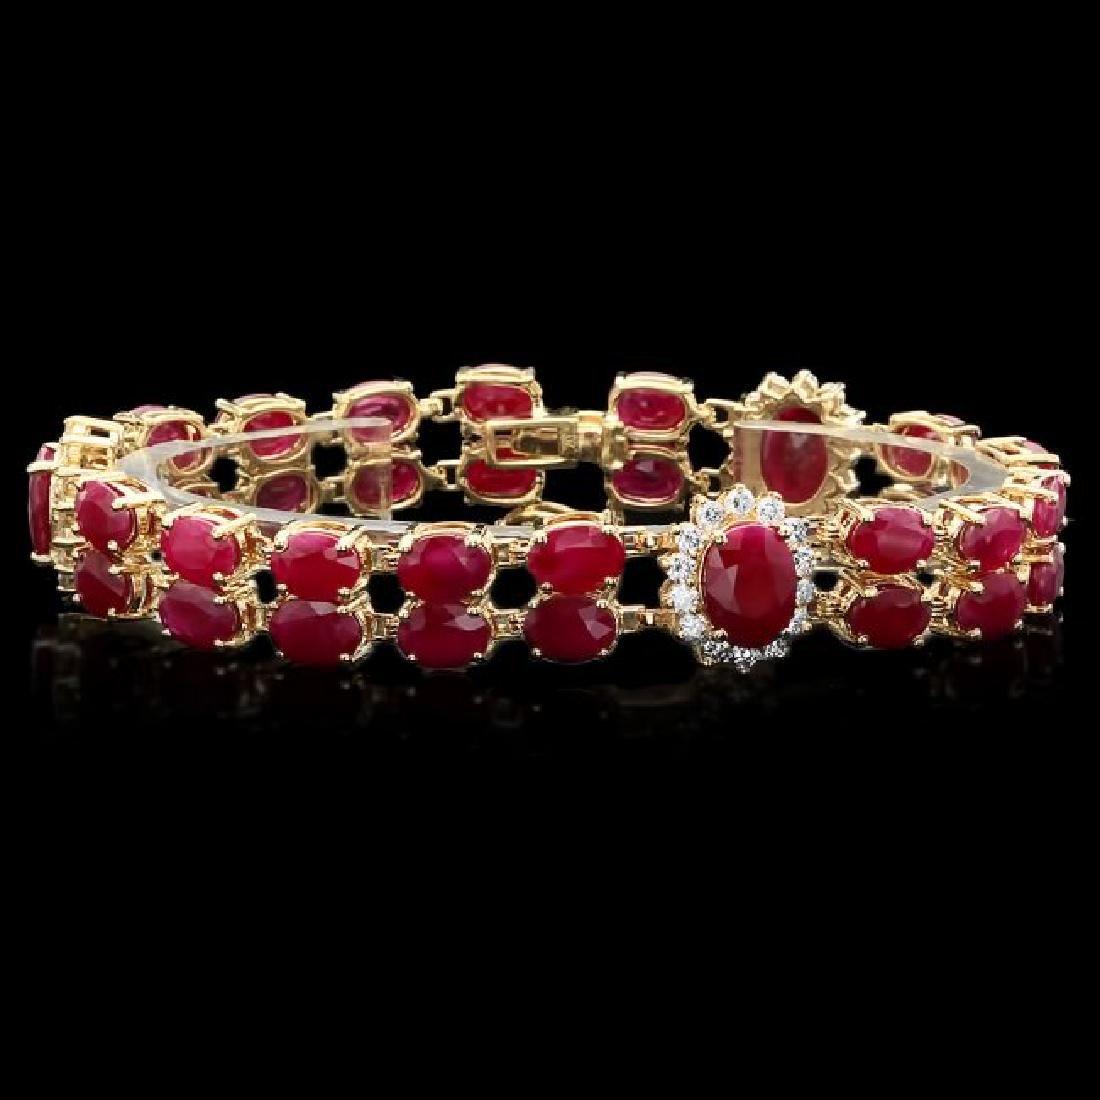 14k Gold 36.0ct Ruby 1.90ct Diamond Bracelet